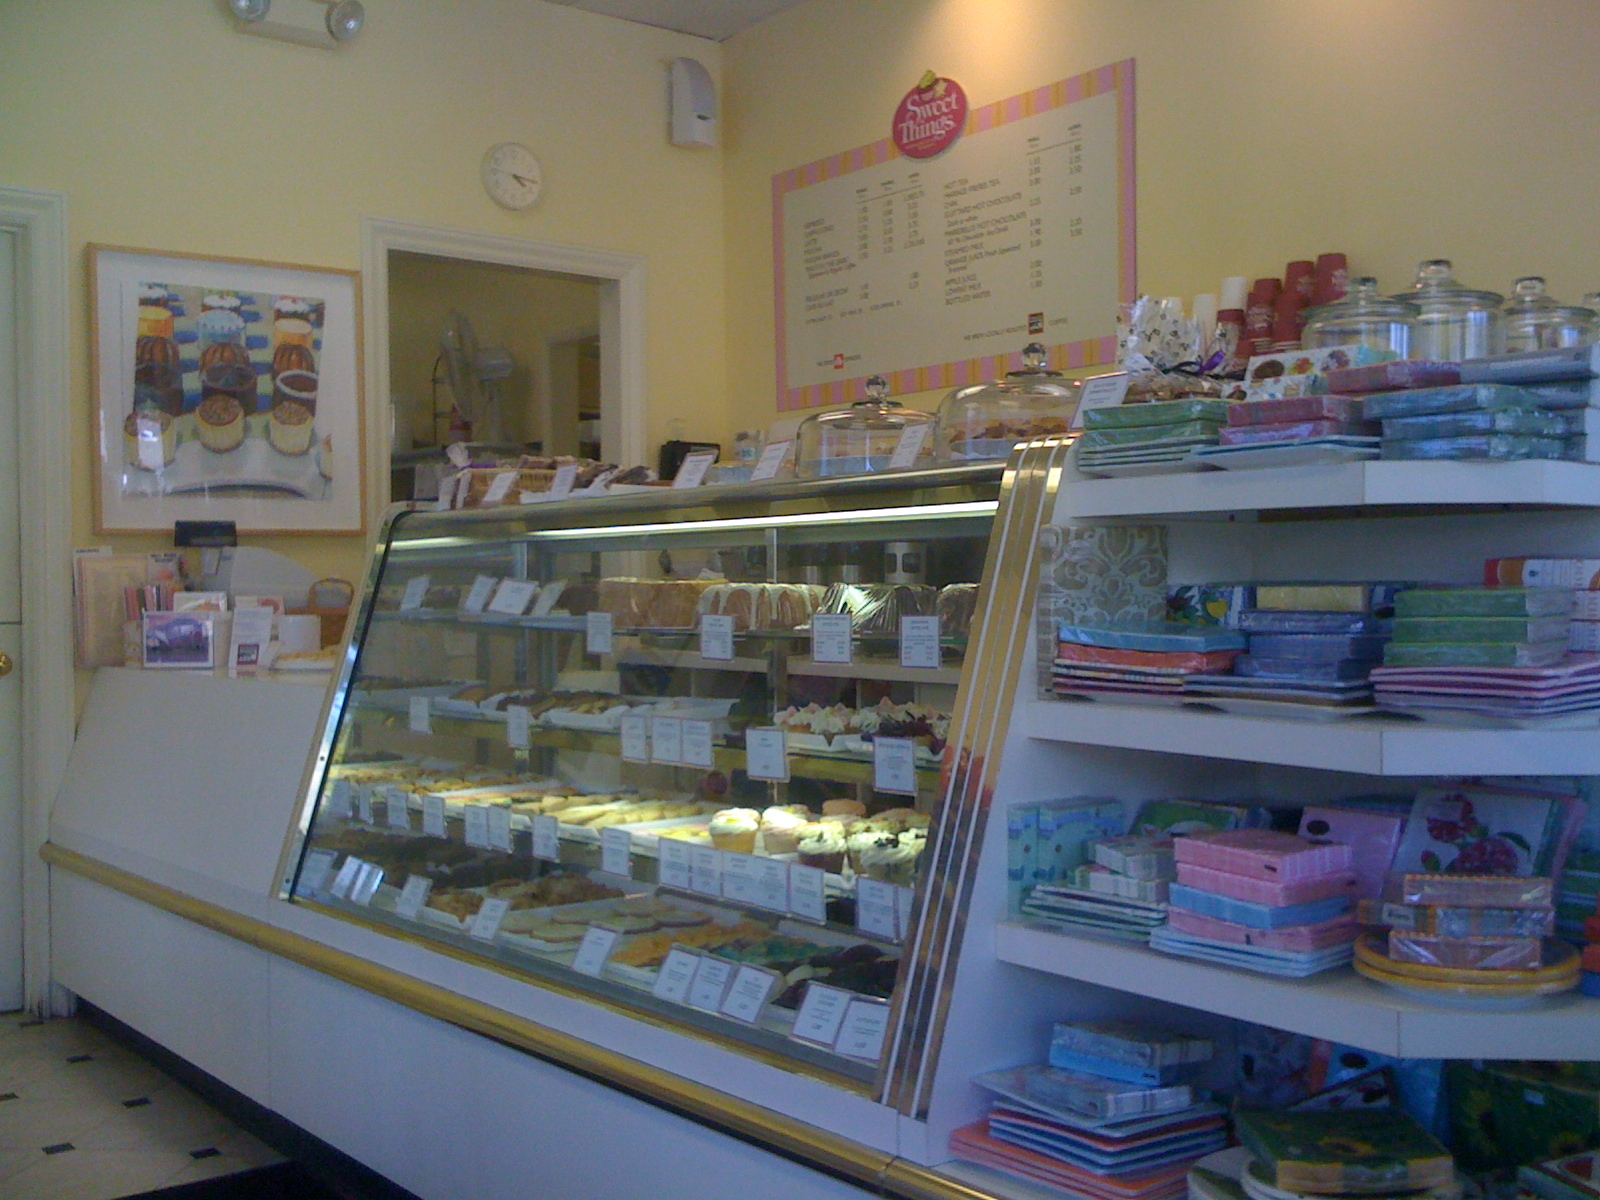 Cake Art San Rafael Hours : Cool Store 365 Things to Do - Marin